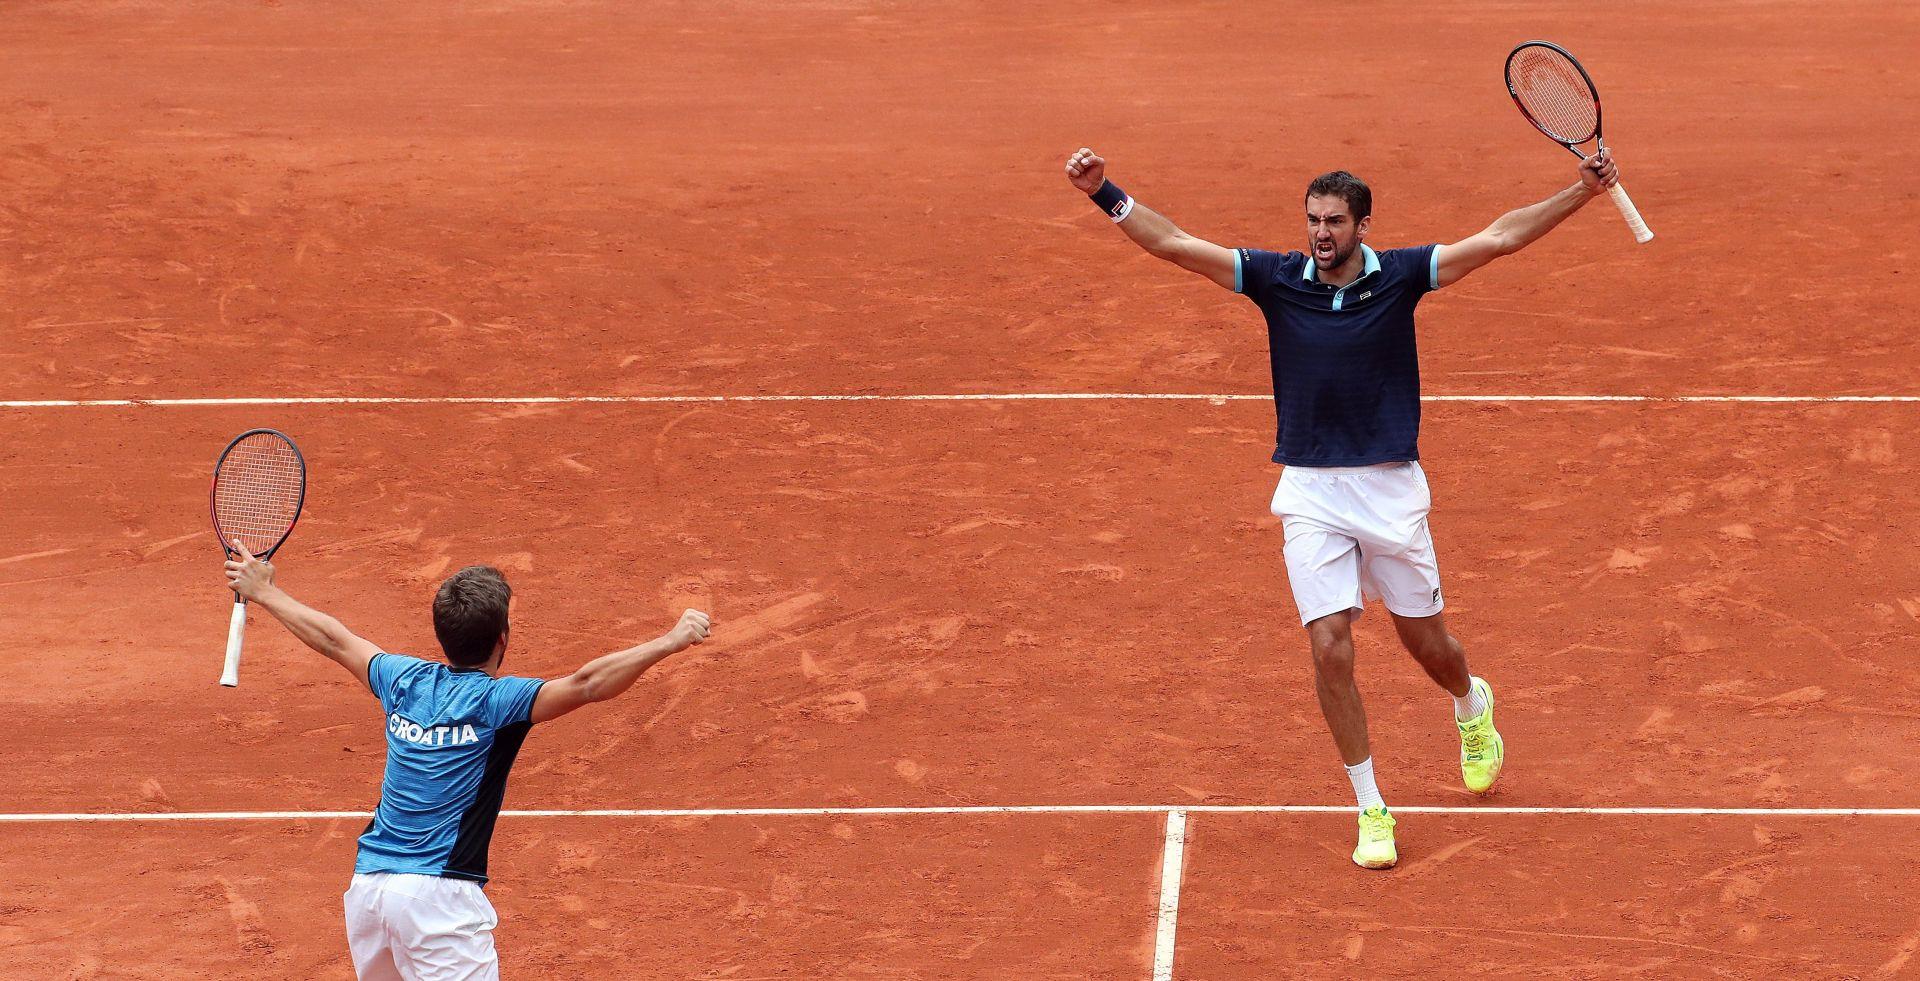 ATP MADRID Mektić i Peya u polufinalu